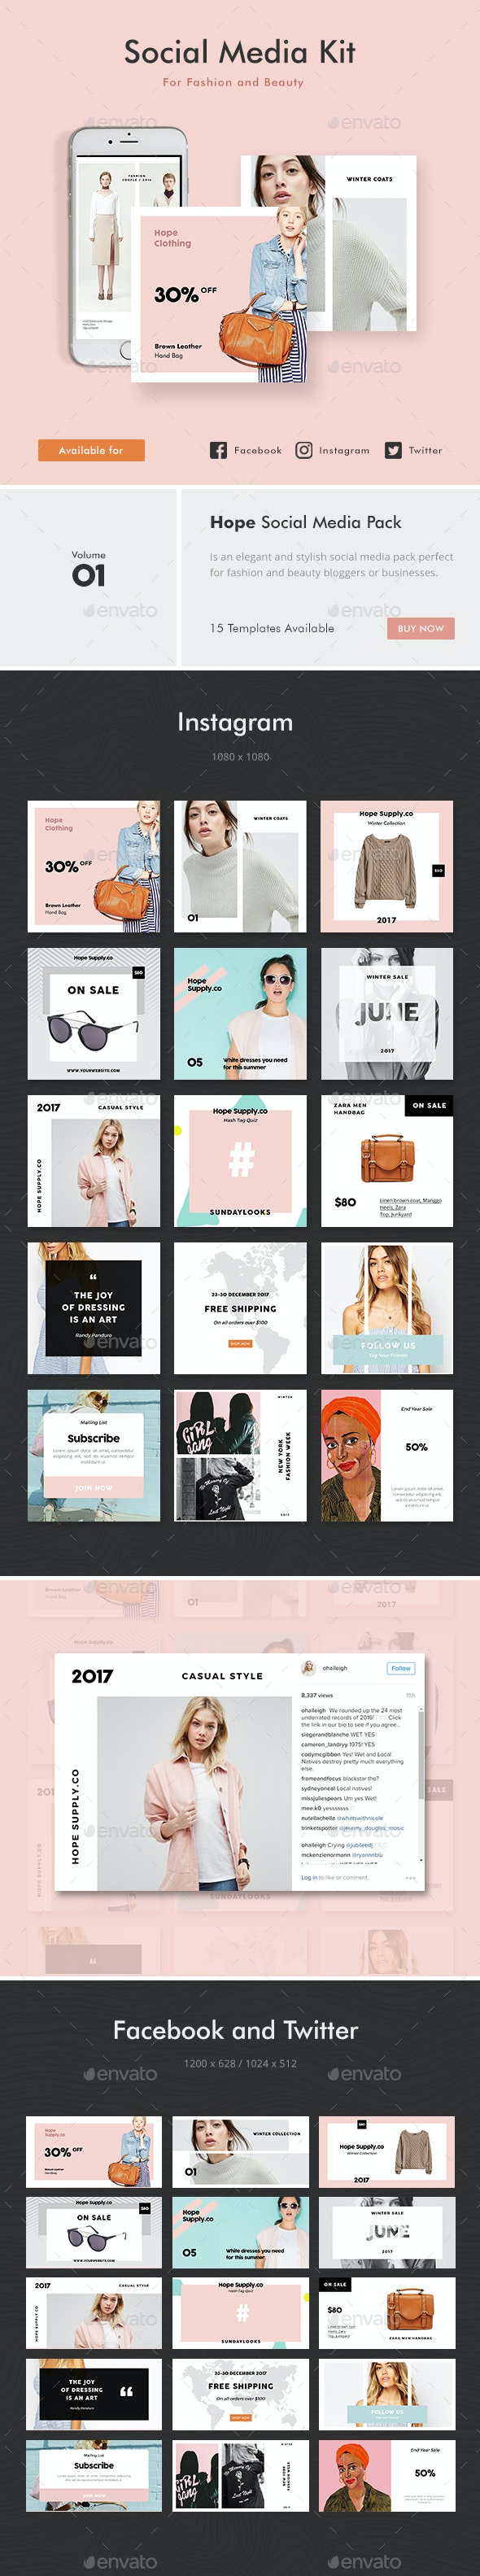 Social Media Kit 1 - Social Media Web Elements